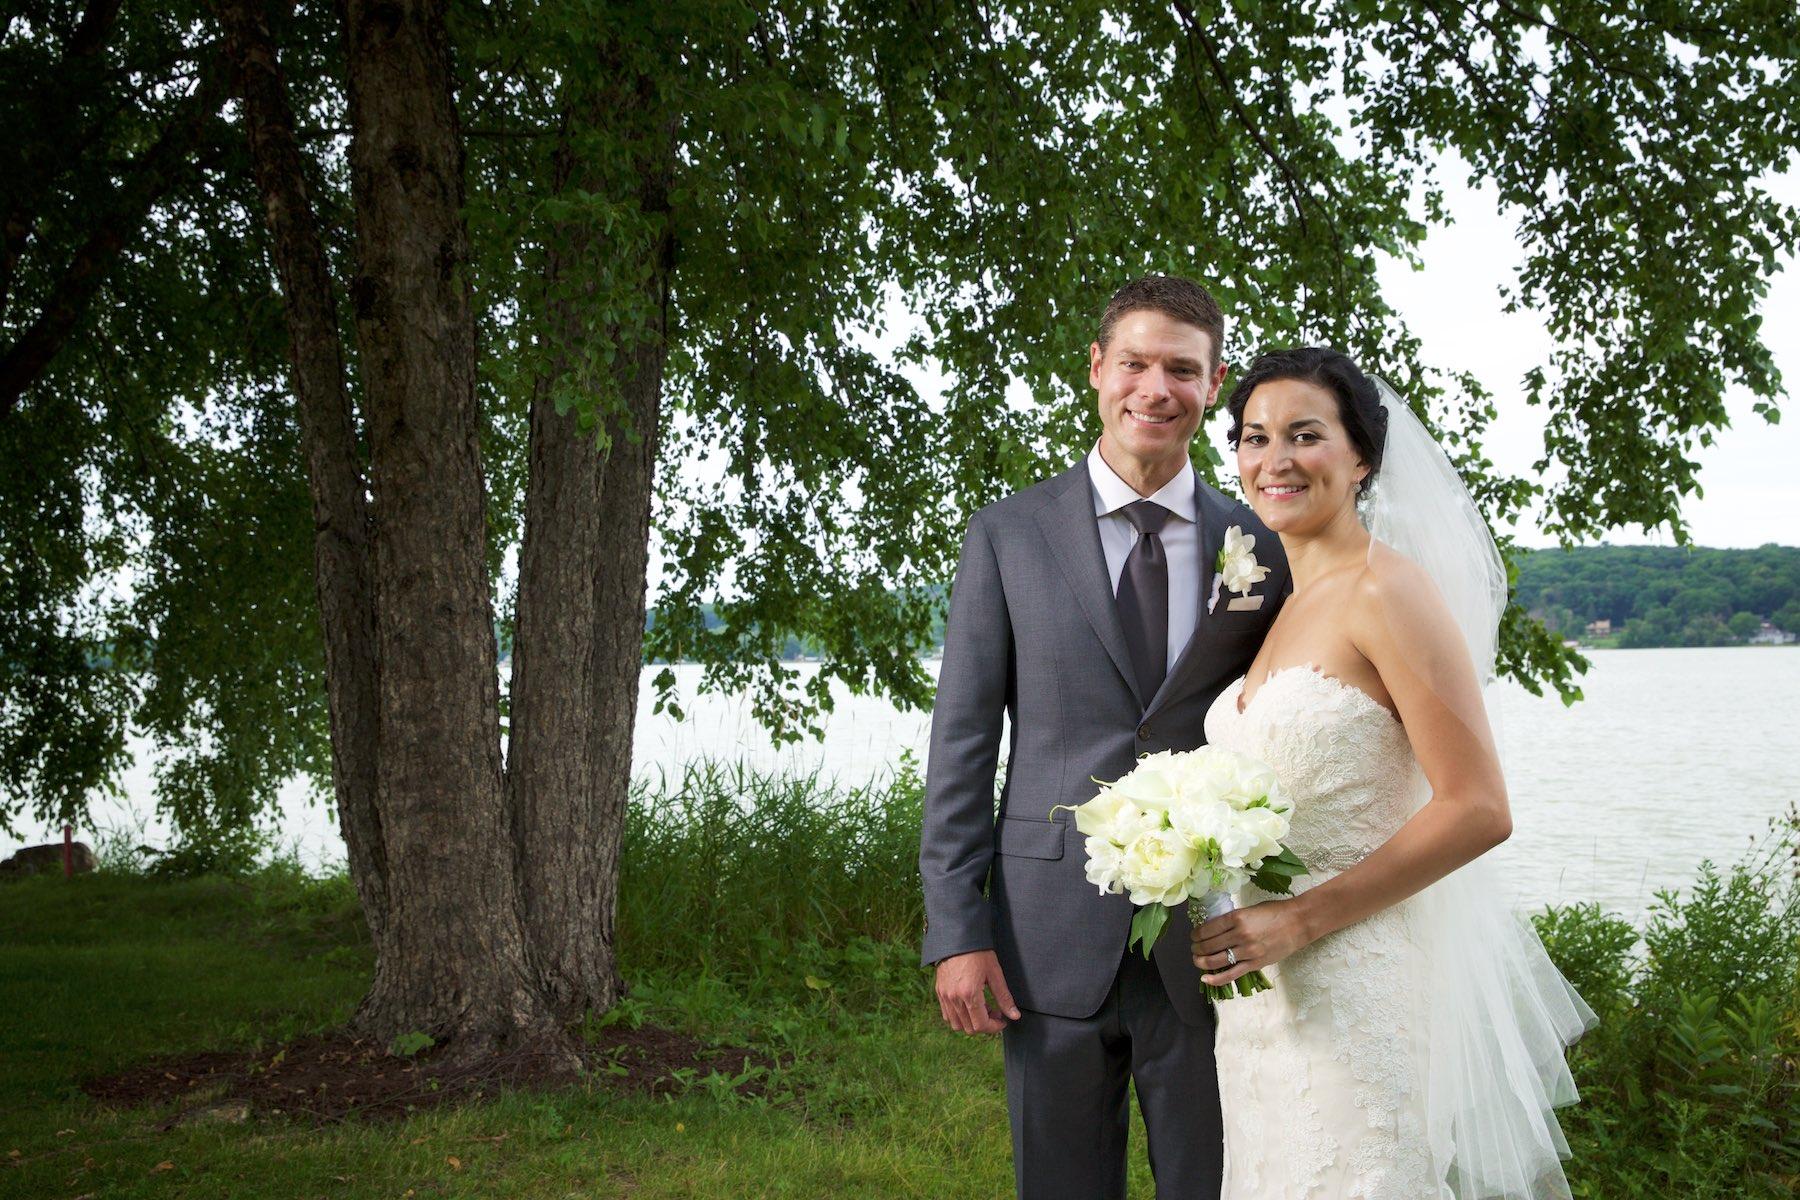 Outdoor portraits, Emi & Daniel's wedding at Geneva National Golf Club in Lake Geneva, Wisconsin. Wedding photography by Steve & Tiffany Warmowski.